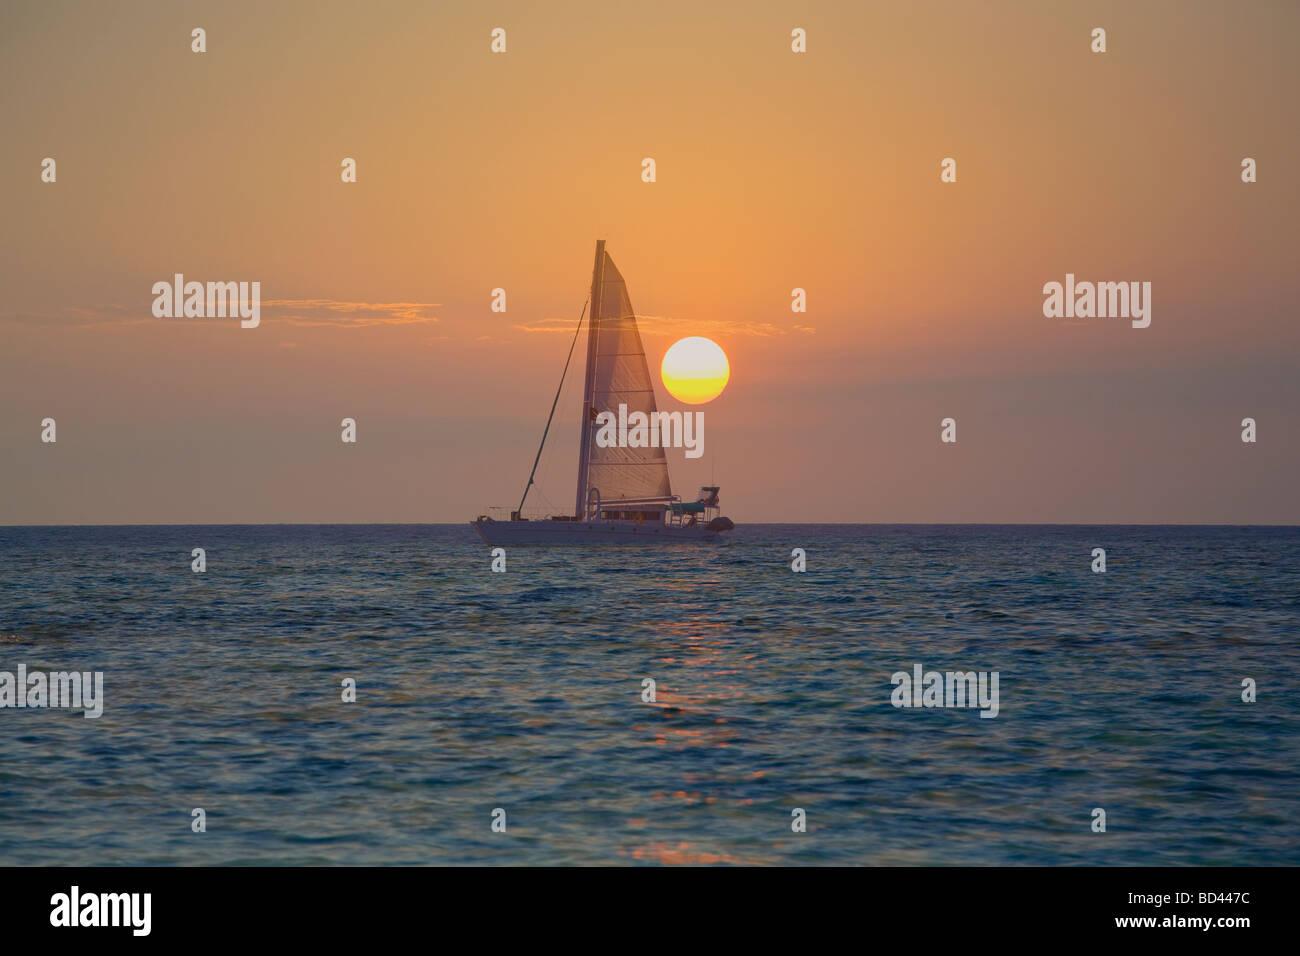 Sailboat against the sunrise, Roatan Island, Honduras - Stock Image